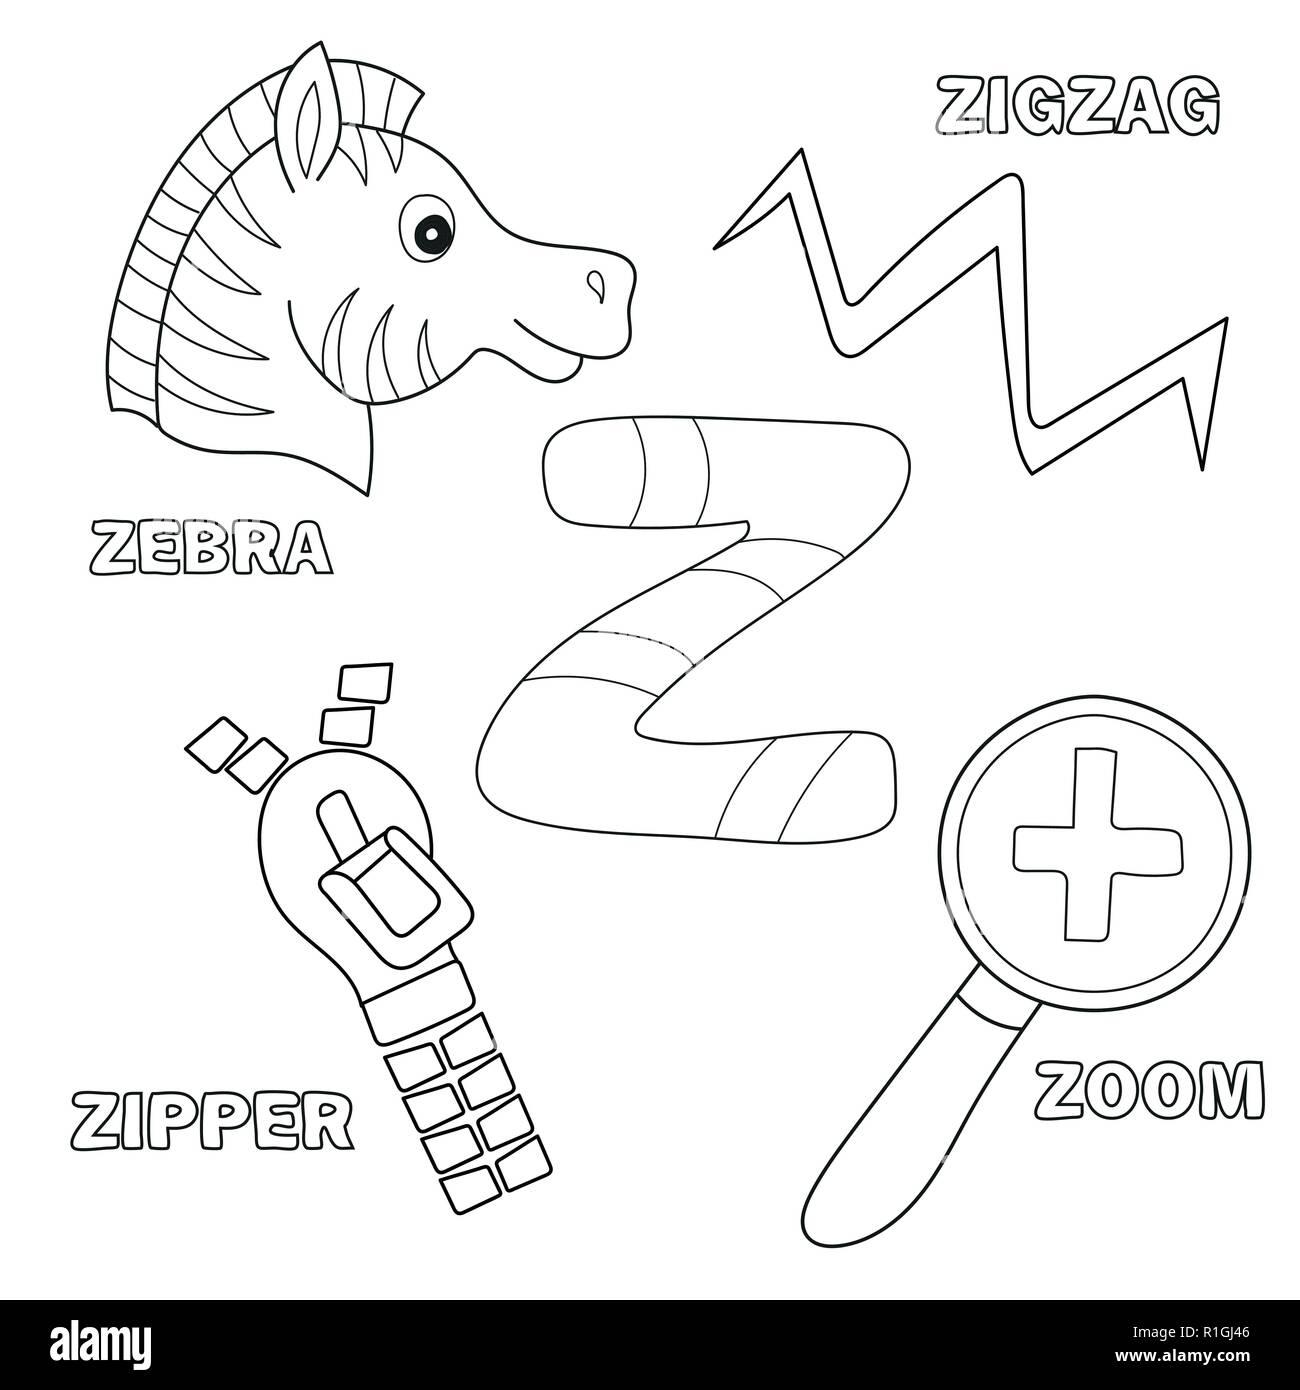 Cartoon Illustration Zipper Clip Art Stock Photos